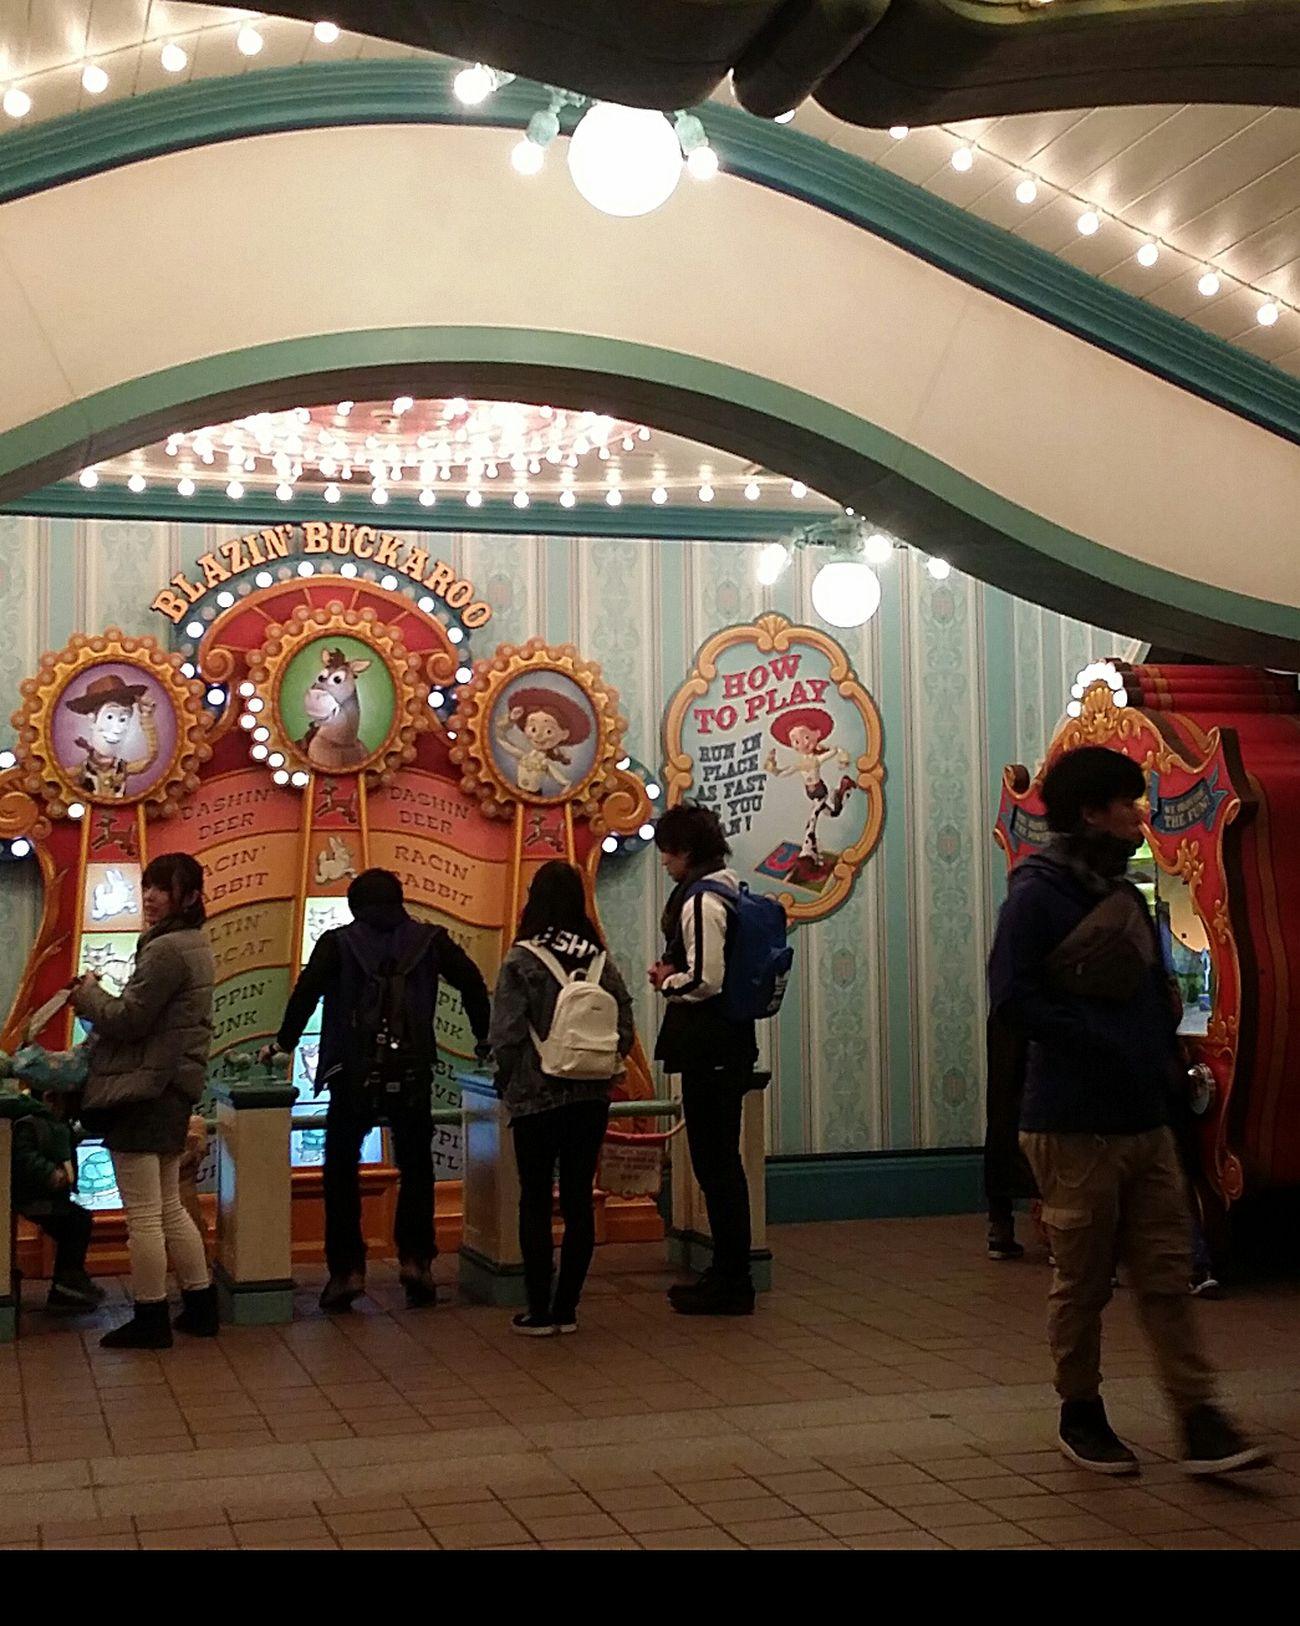 My Son My Son In Tokyo Resort Theme Park Toyville Toyville Trolley Park Toystory Illuminated Tokyodisneysea DisneySea Tokyo Japan JapanDec2016 TokyoDec2016